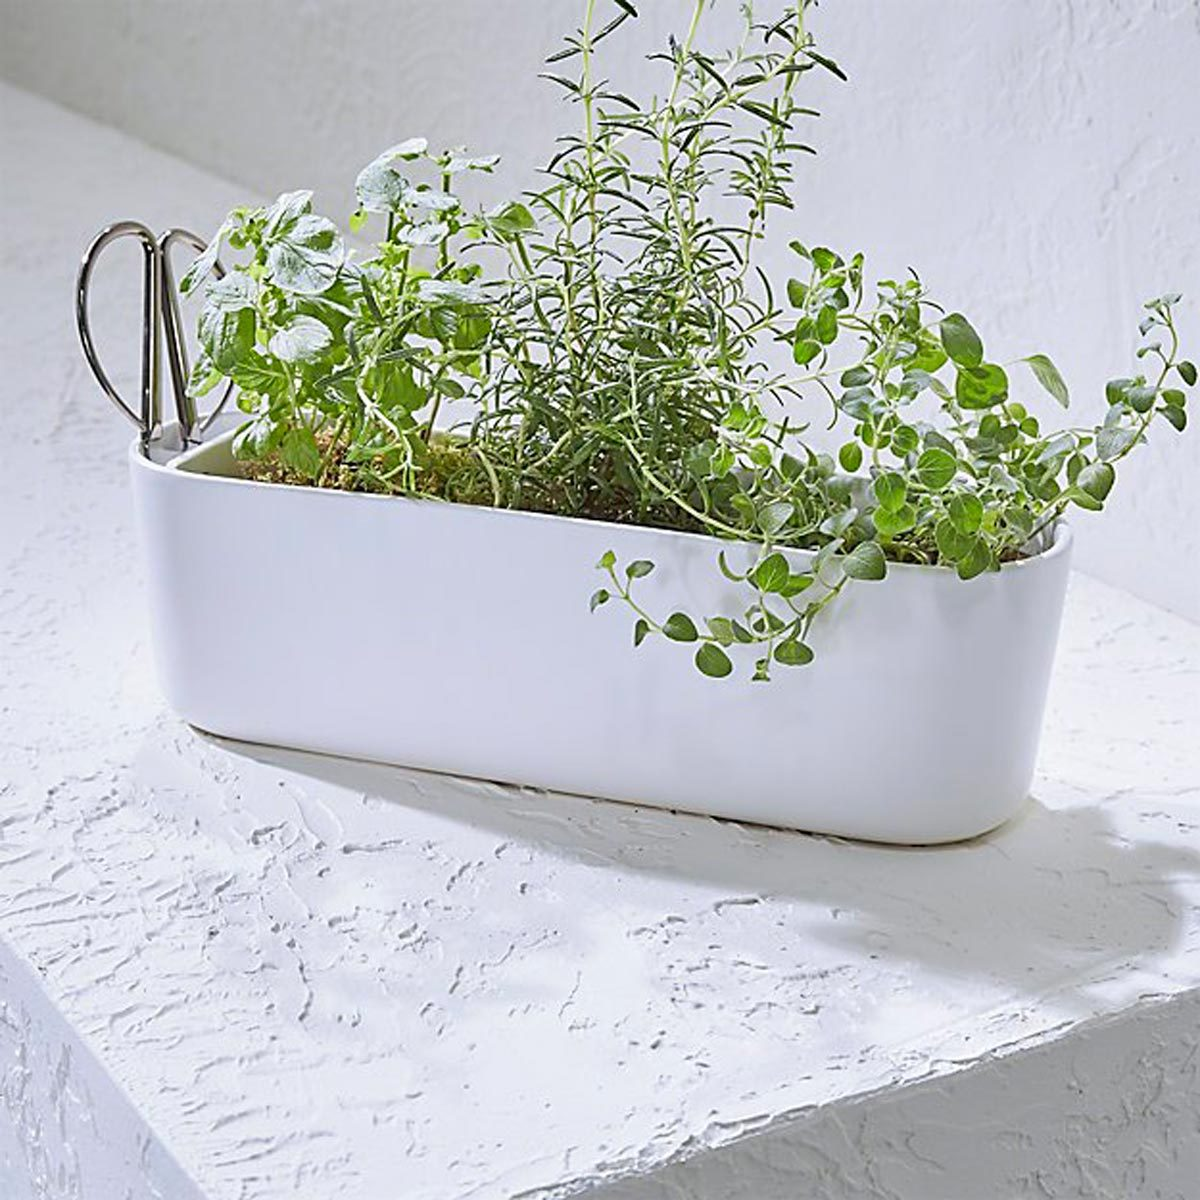 10 Charming Indoor Herb Garden Planters Family Handyman